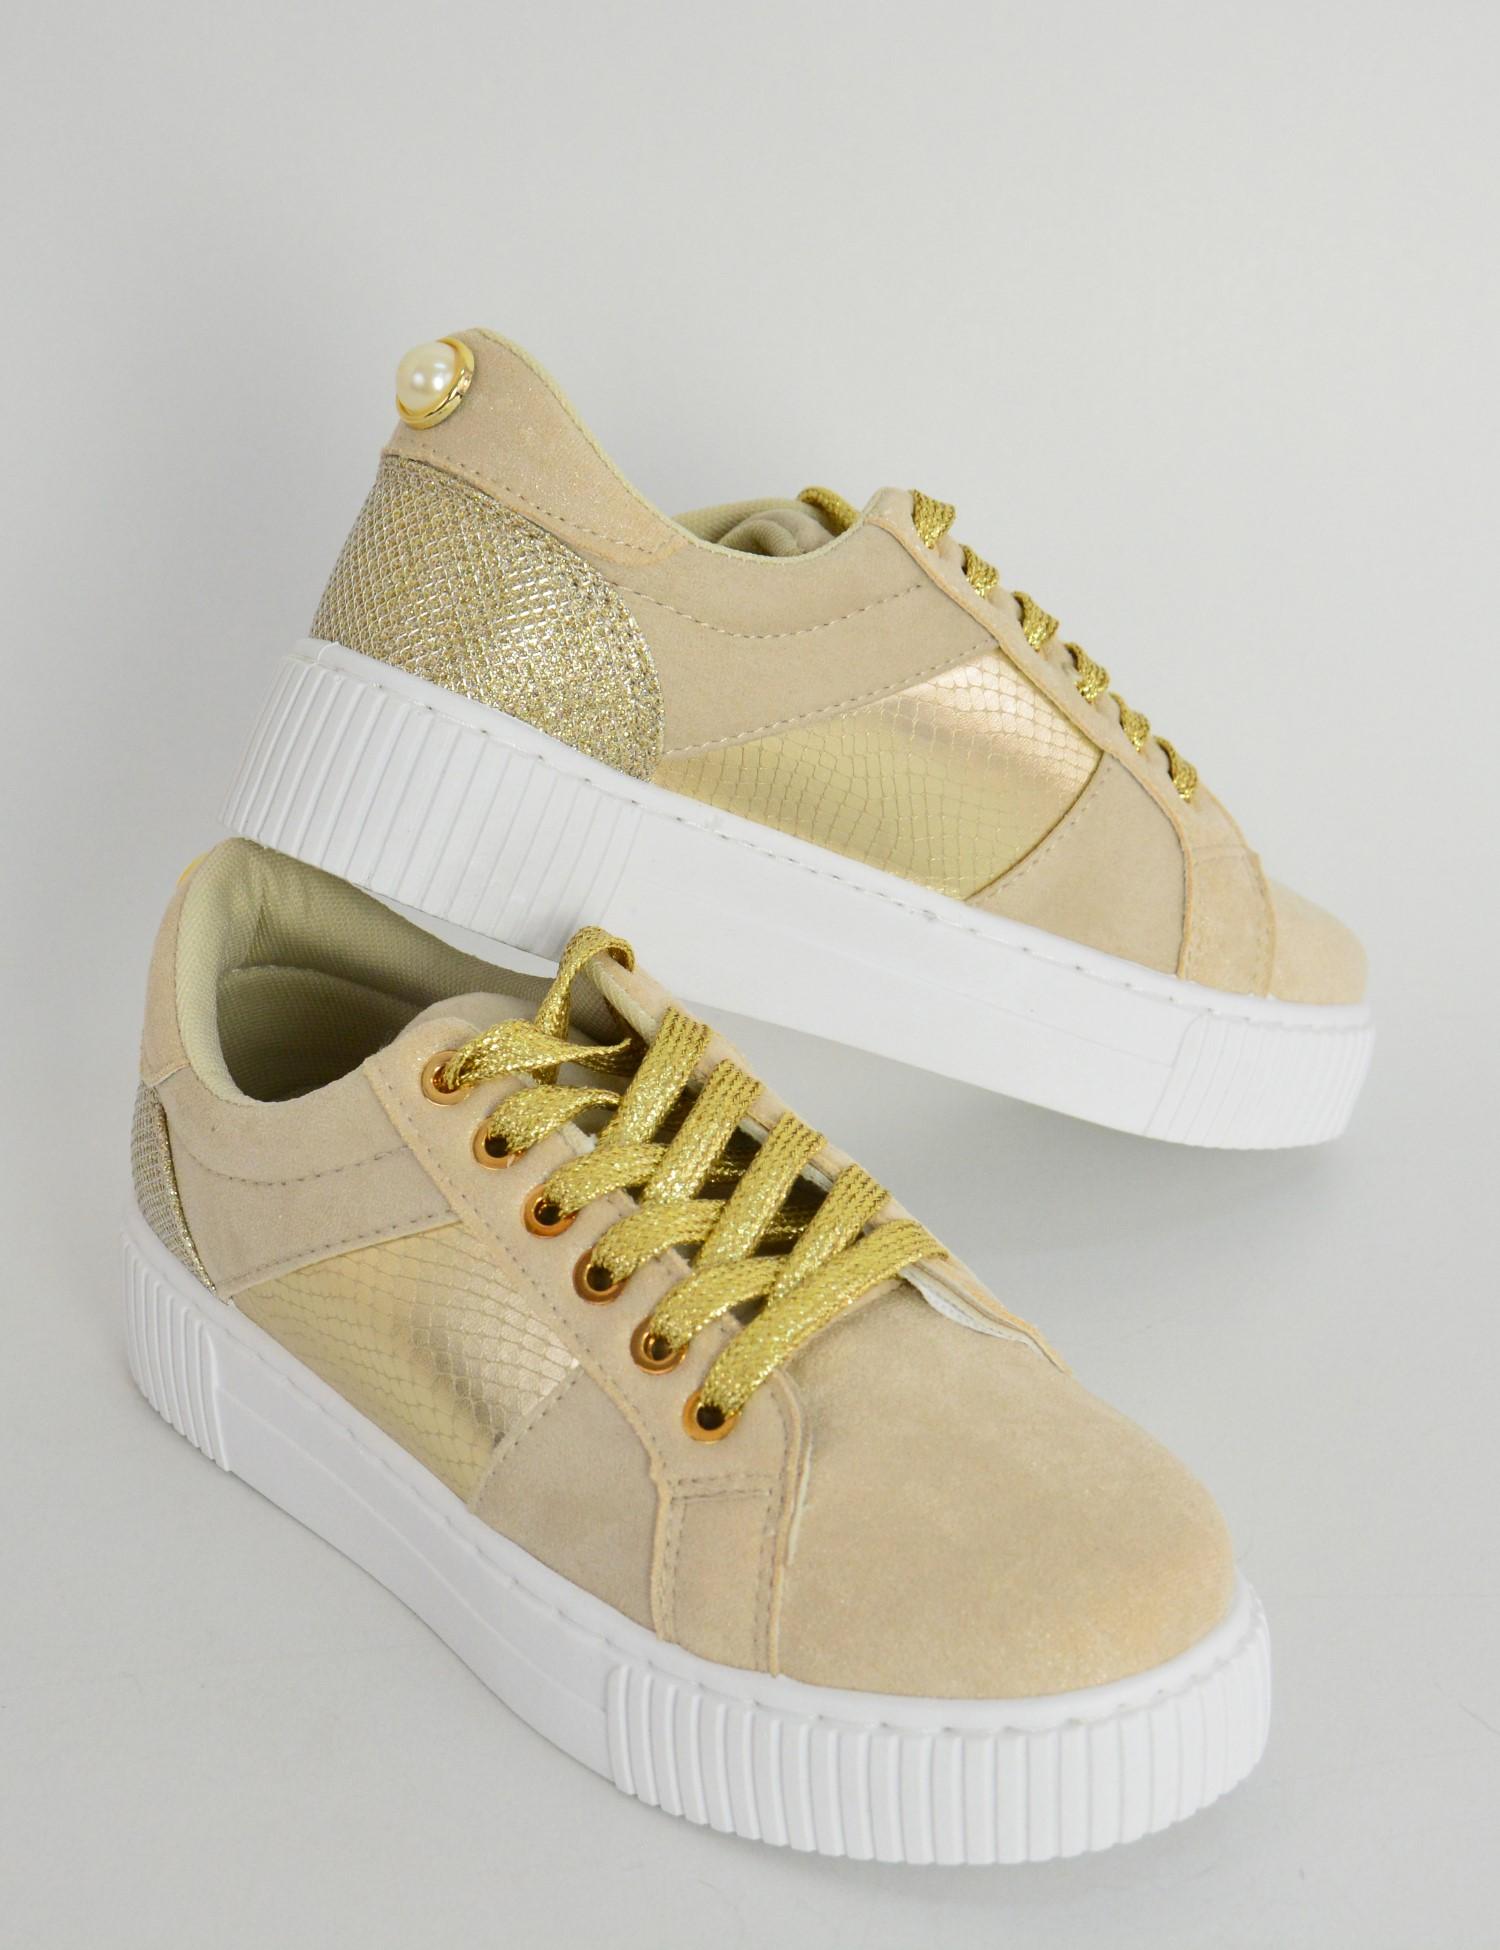 ToRouxo.gr - Γυναικεία Sneakers Παπούτσια - Σελίδα 2  2b4af5cd4ae